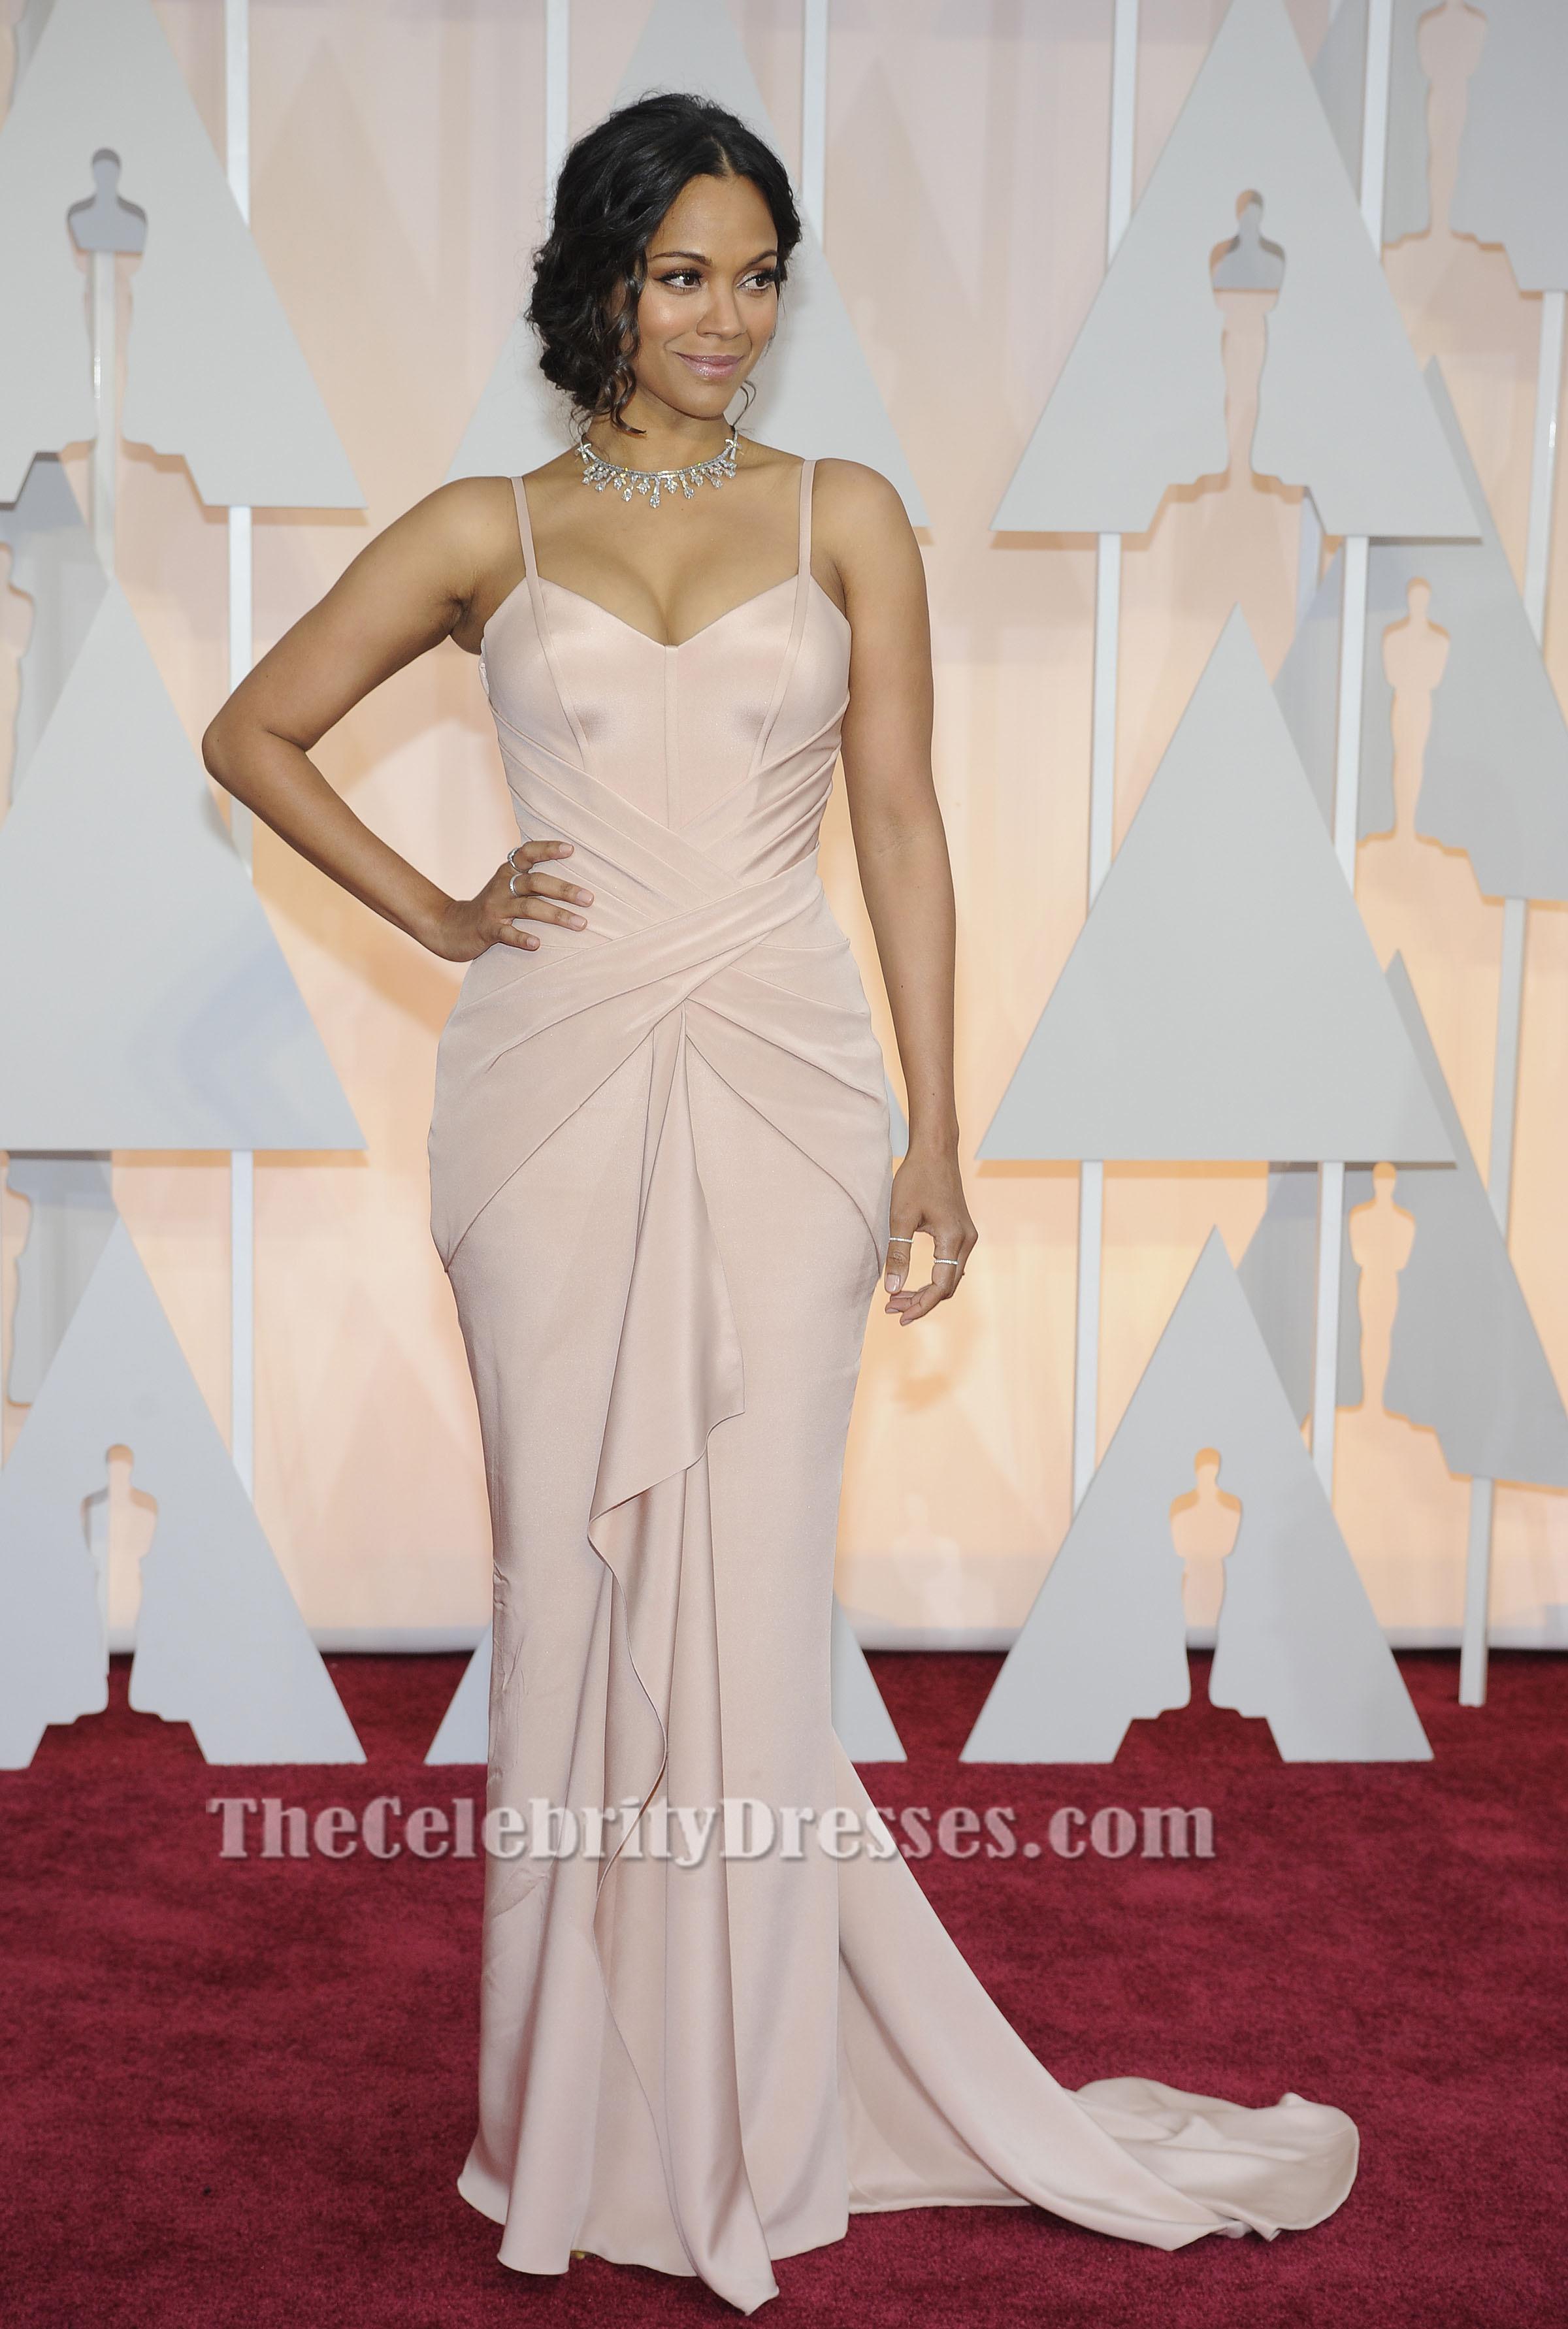 Zoe Saldana Soft Pink Formal Evening Dress 2015 Oscars Red Carpet ...